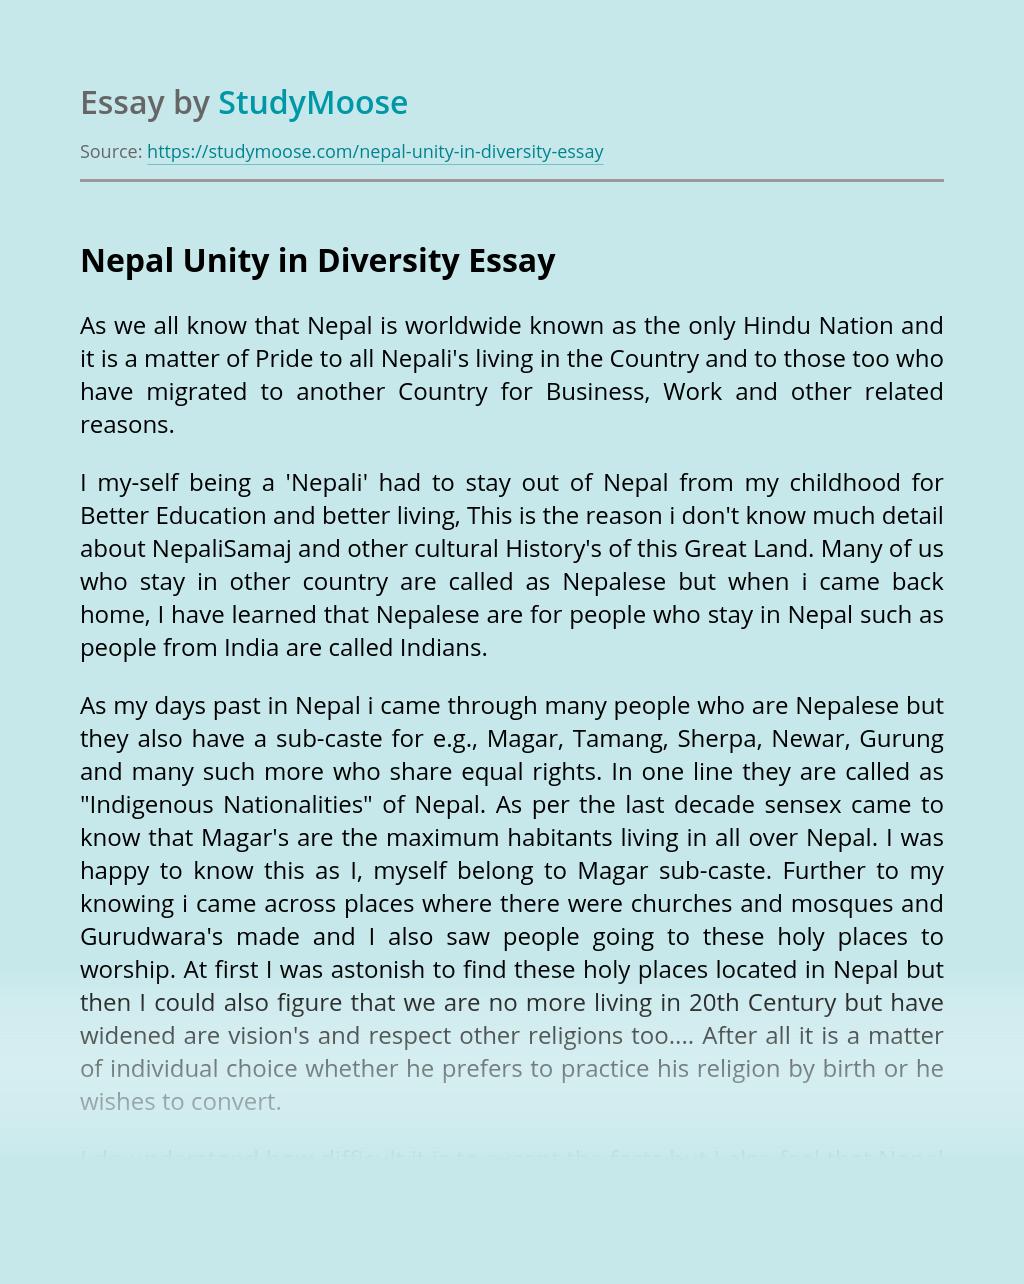 Nepal Unity in Diversity